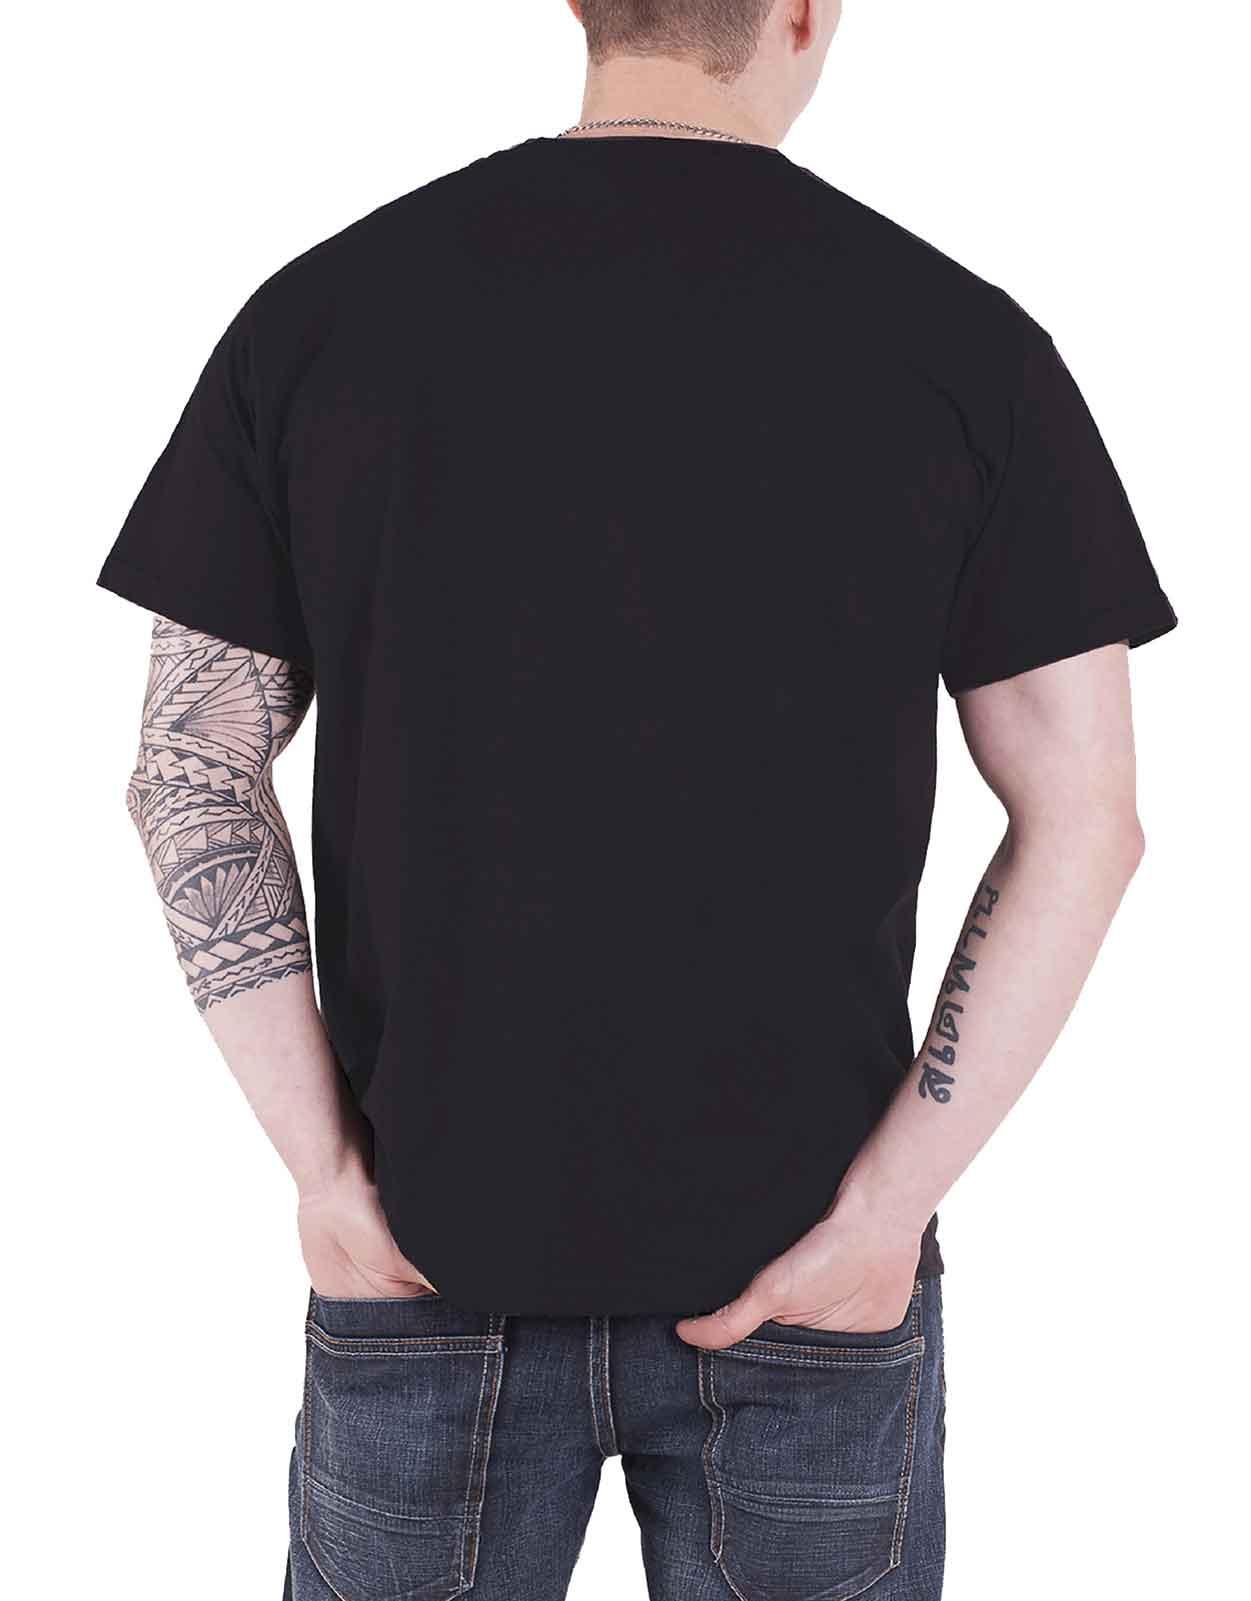 Officiel-Metallica-T-shirt-filaire-justice-for-all-RTL-Band-Logo-Homme-Nouveau miniature 5